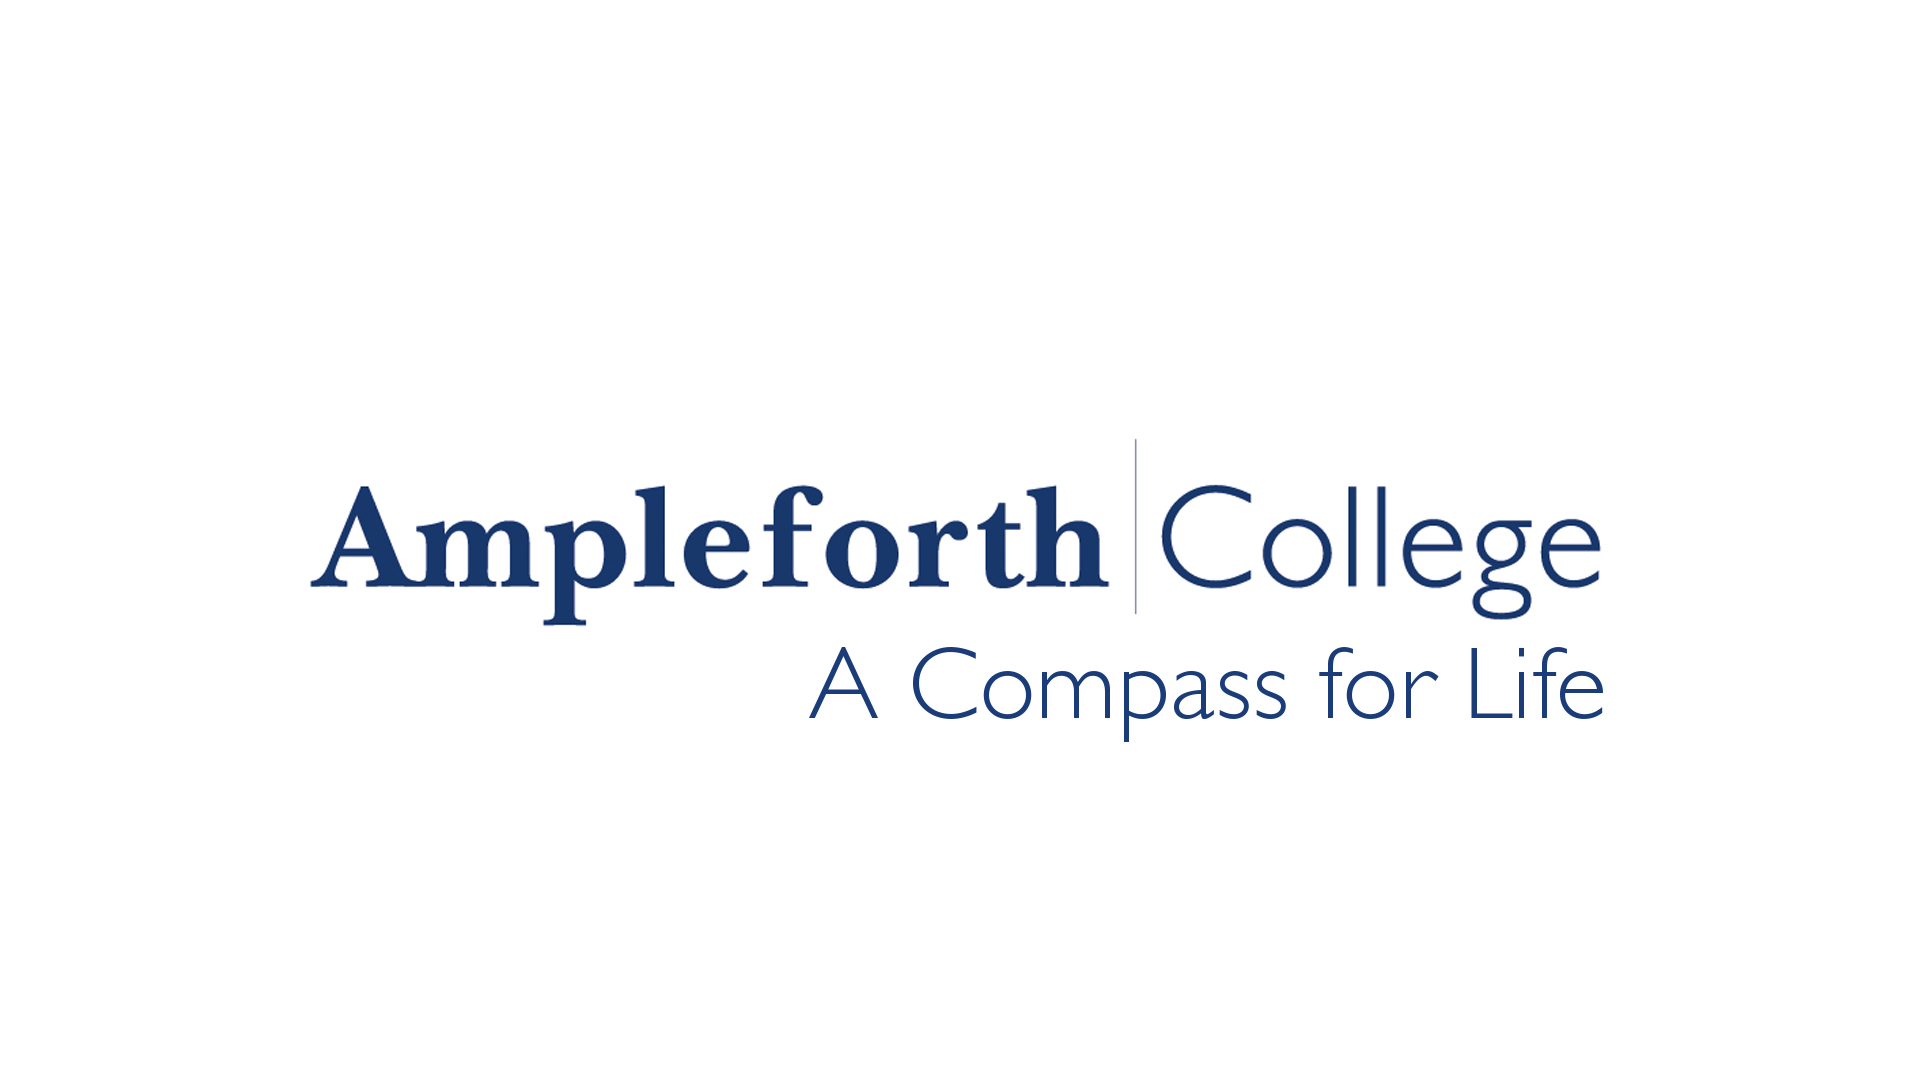 Ampleforth-College-Brand-Identity-Logo